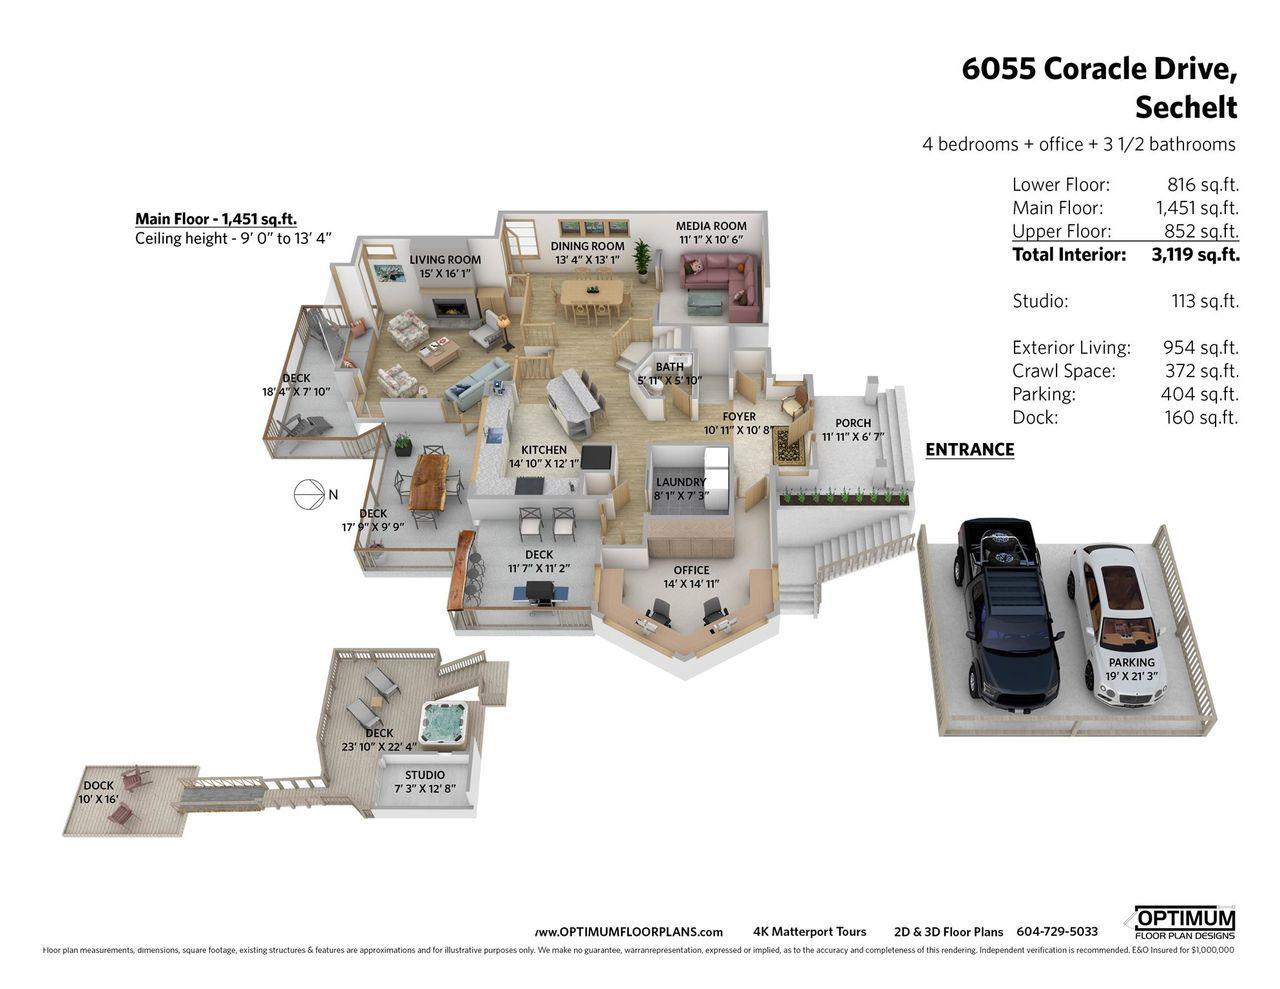 6055-coracle-drive-sechelt-district-sunshine-coast-39.jpg